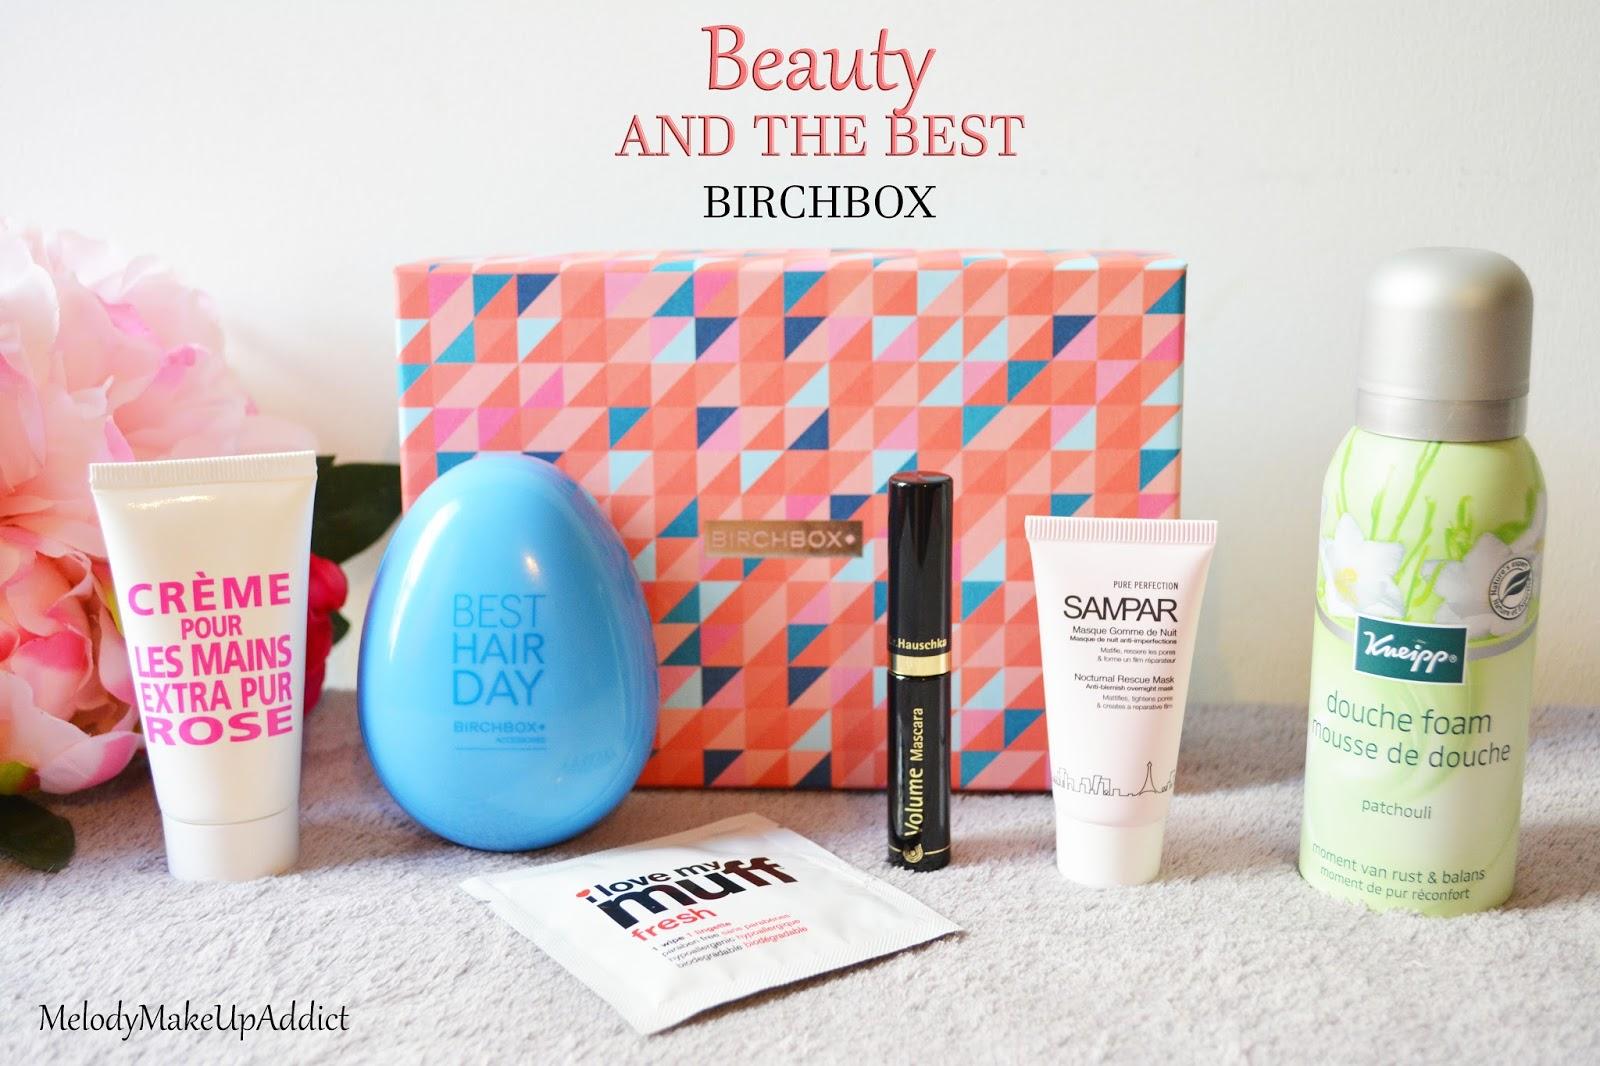 http://melodymakeupaddict.blogspot.com/2015/10/birchbox-du-mois-doctobre-beauty-and.html